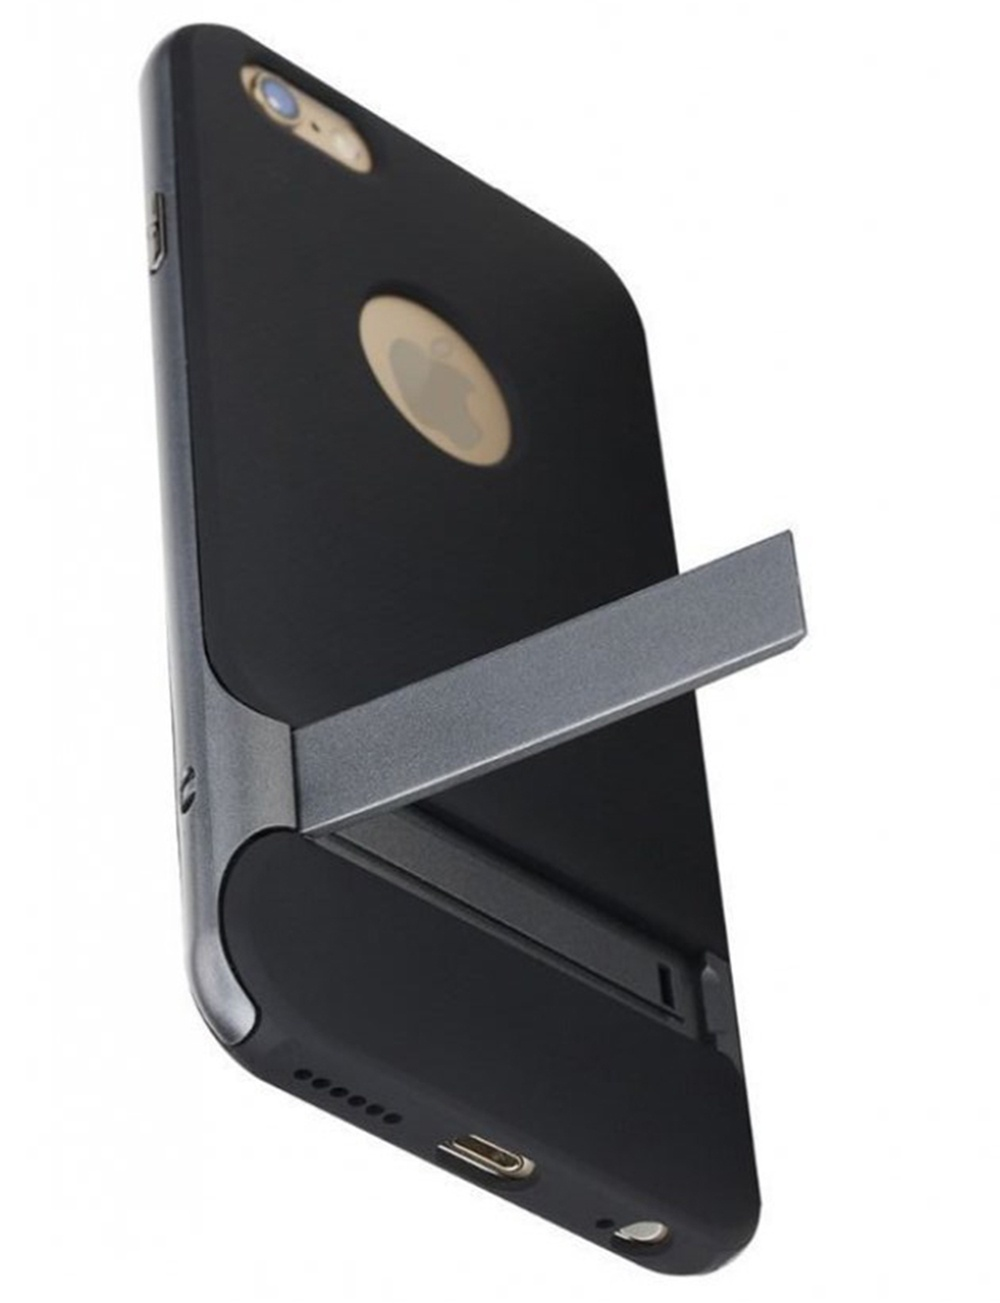 Чехол для сотового телефона ROCK iPhone 7 PlusRoyce Kickstand, серый аксессуар чехол rock elite series для iphone 7 plus brown